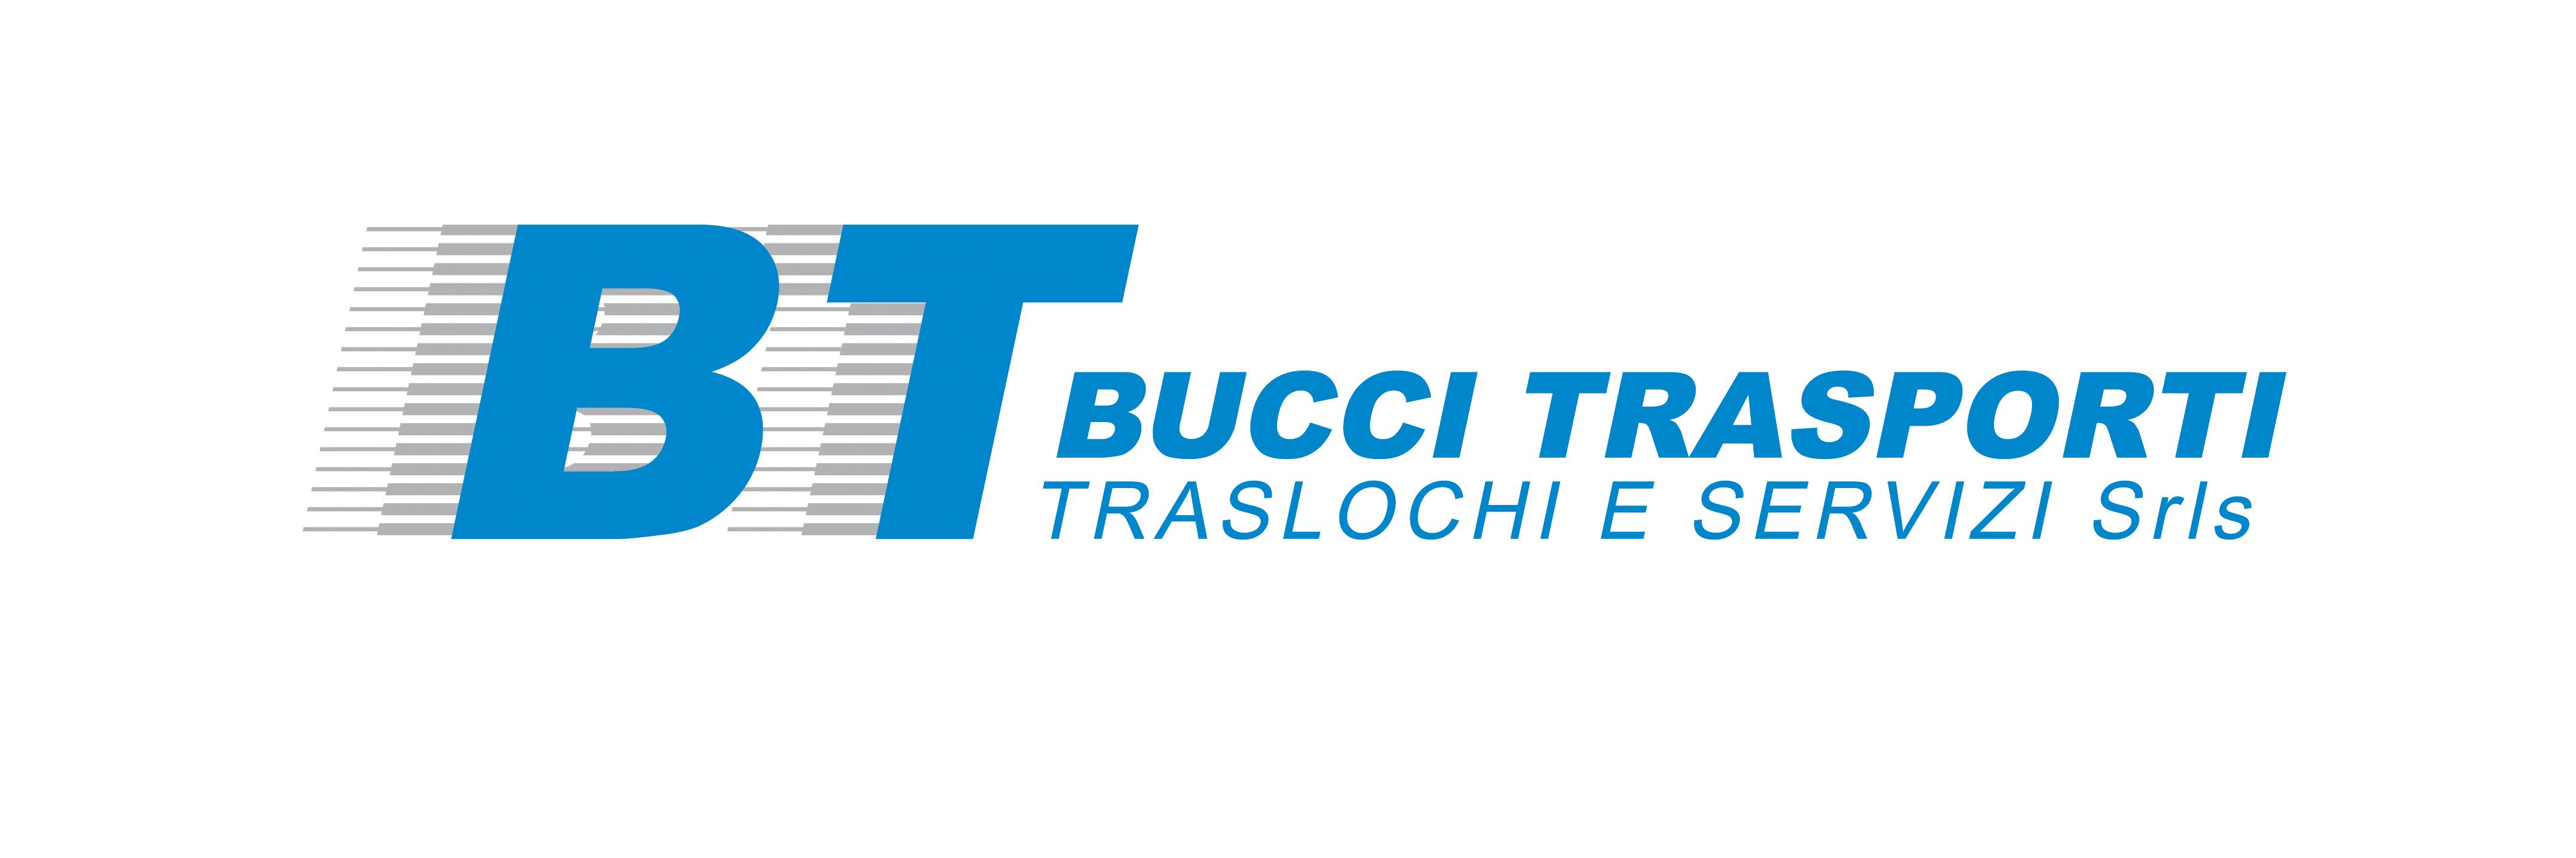 Logo-Bucci-Trasporti-Orizzontale